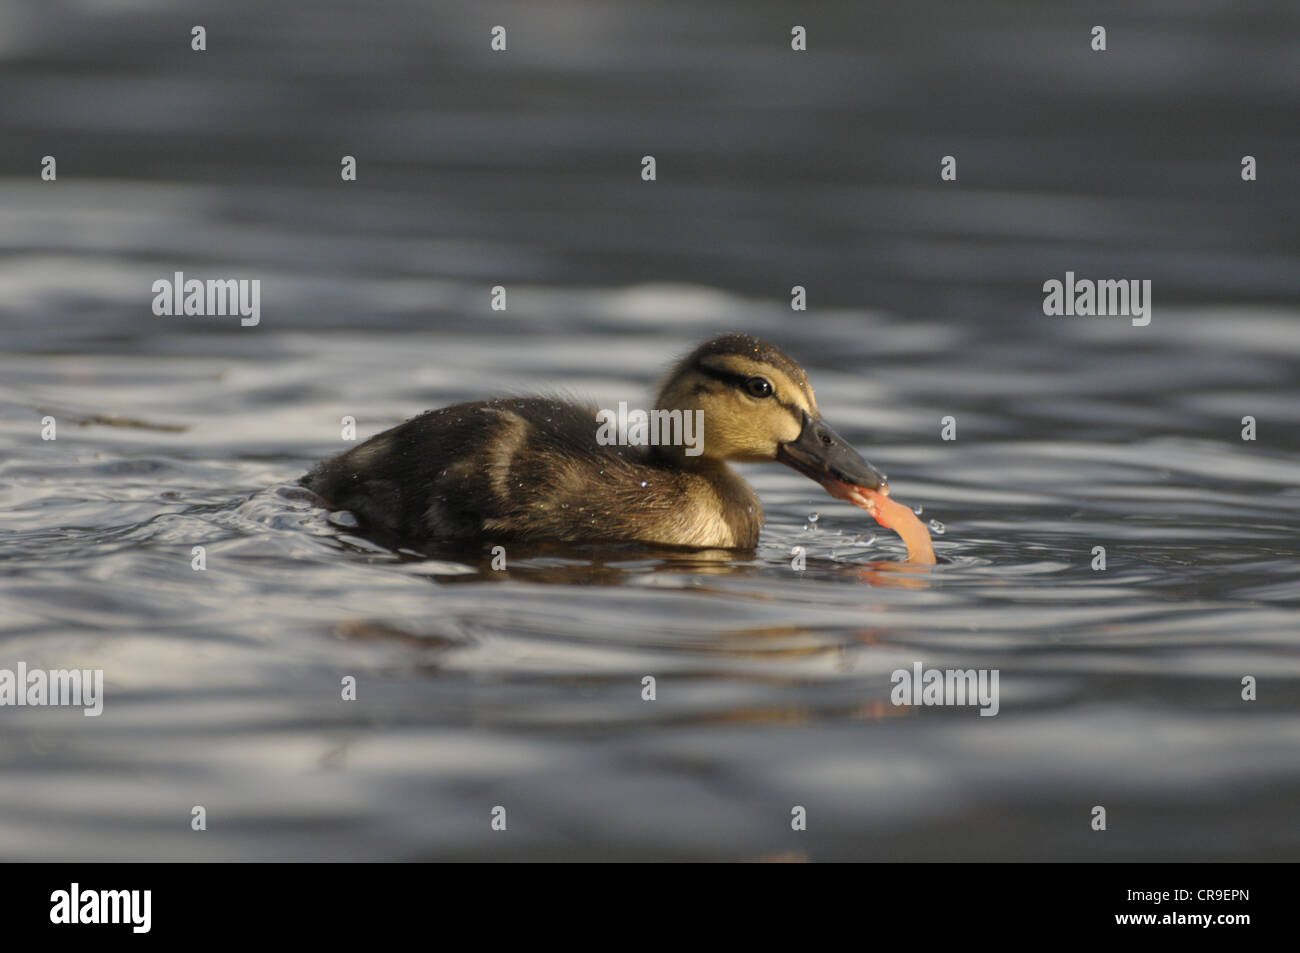 Mallard duckling eating tomato in water, Scotland. - Stock Image